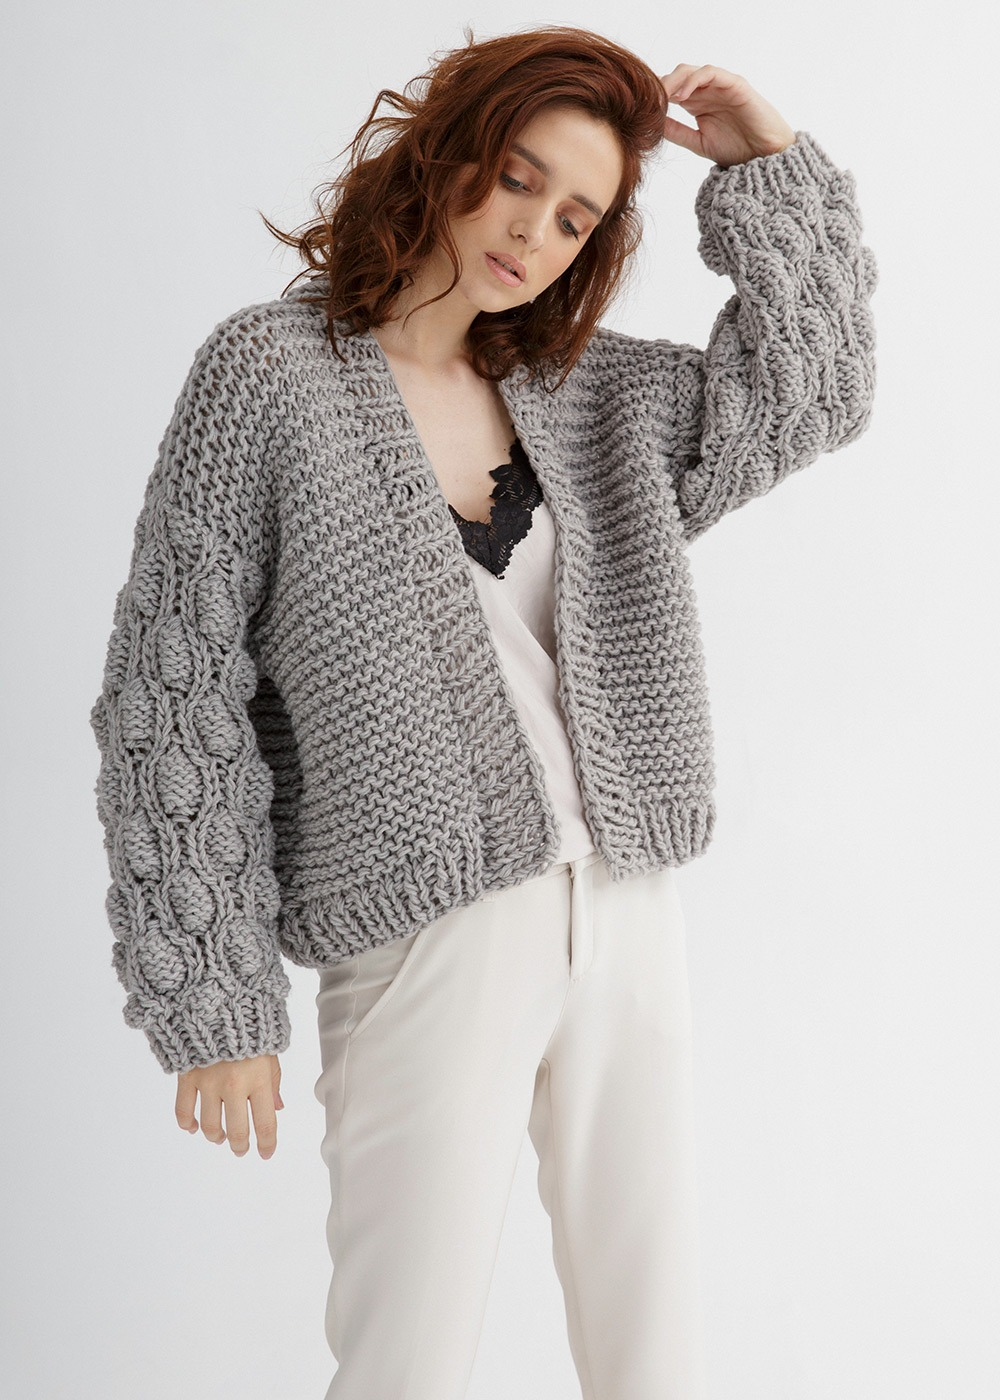 Cropped Cardigan Knitting Pattern - Through the Stitch